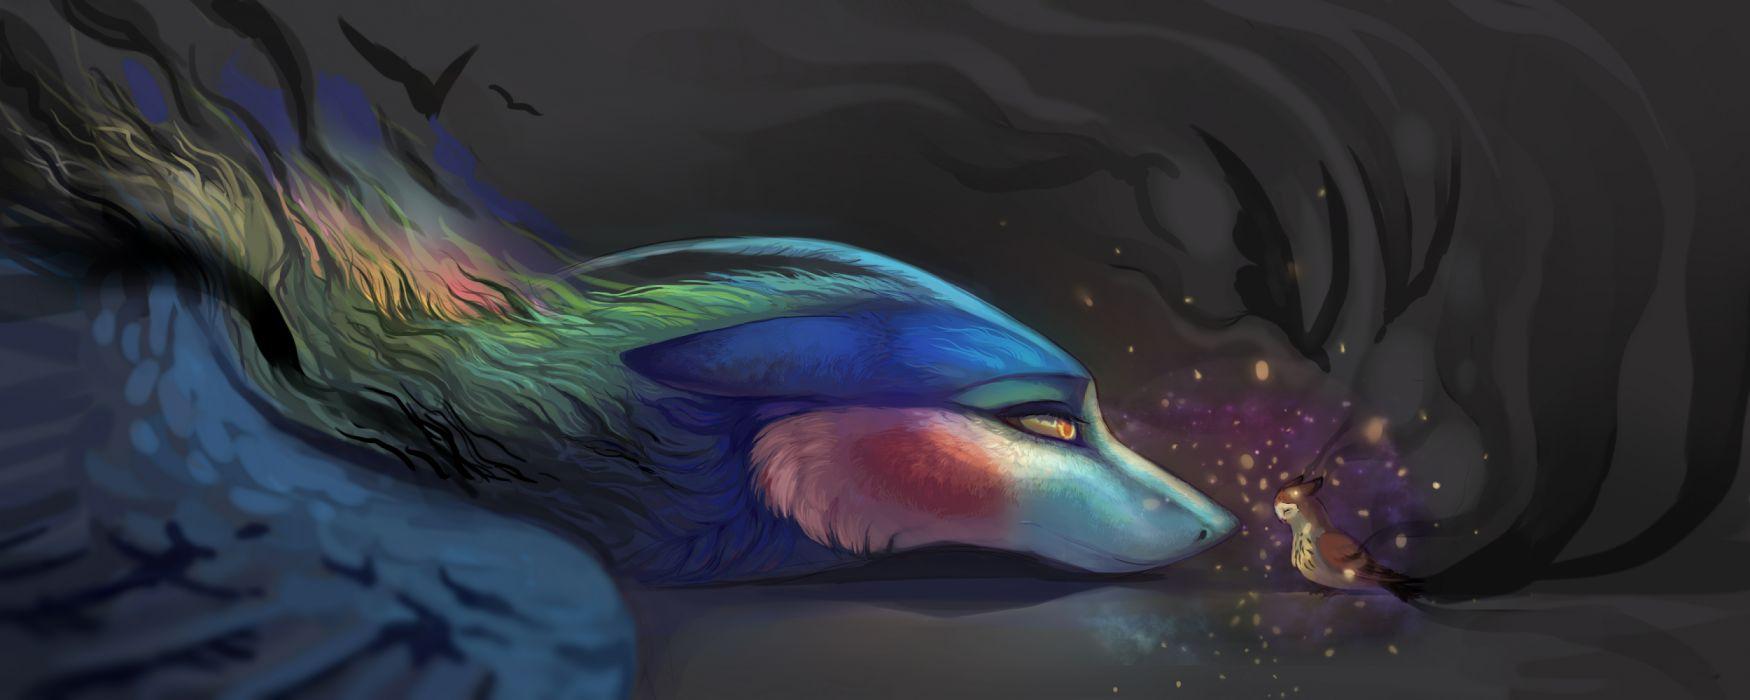 fantasy birds magic beauty wallpaper